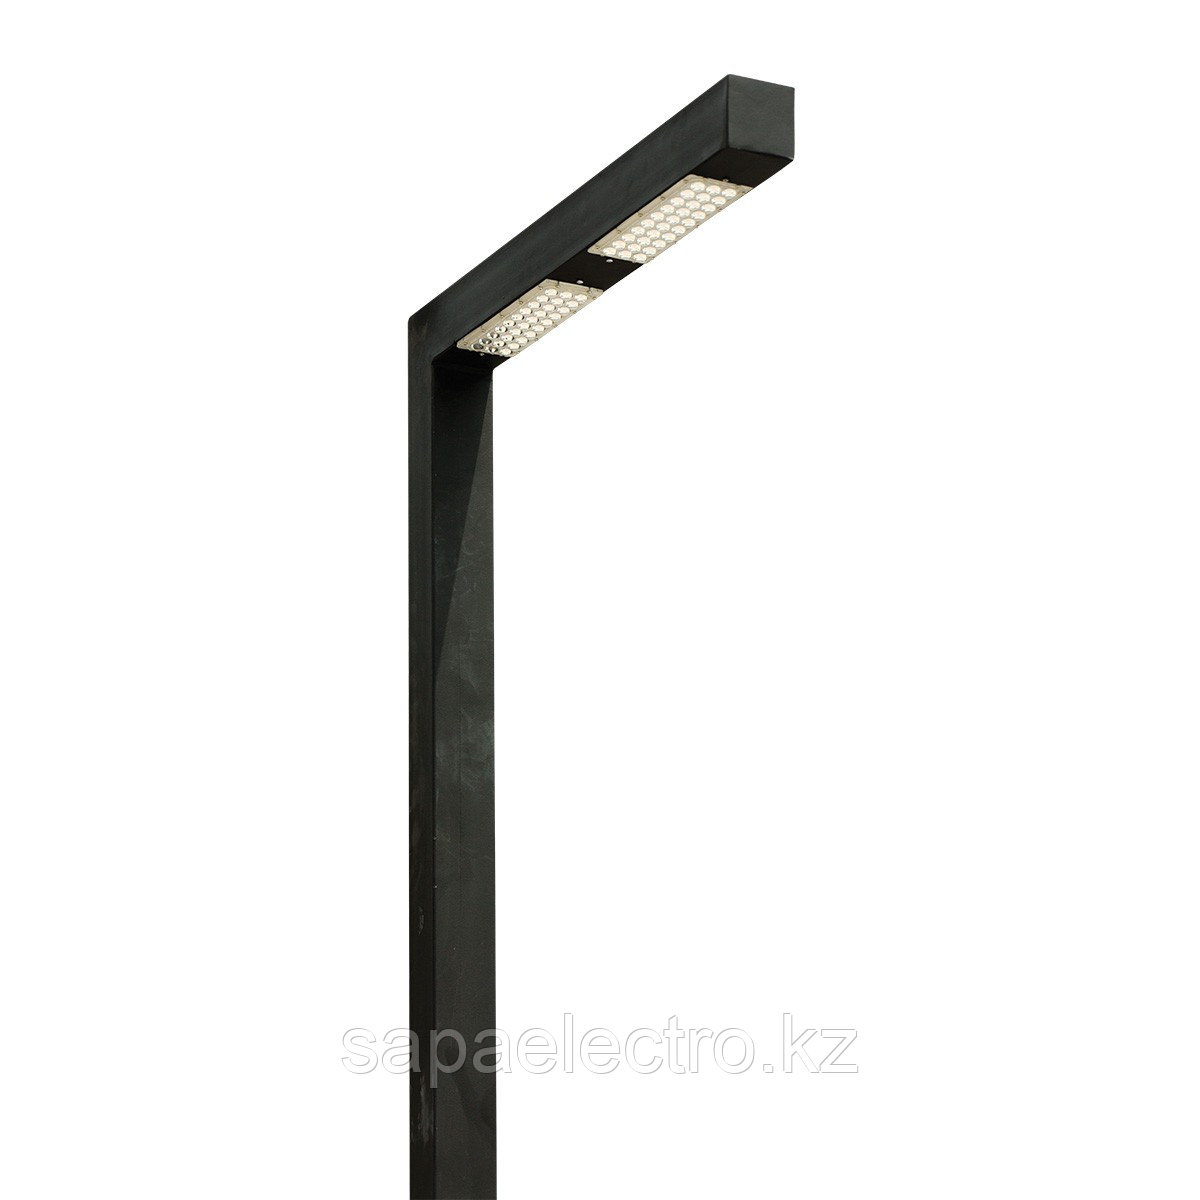 Св-к Профильный LED 60W 80х80 BLACK  H-4м MEGALUX 1